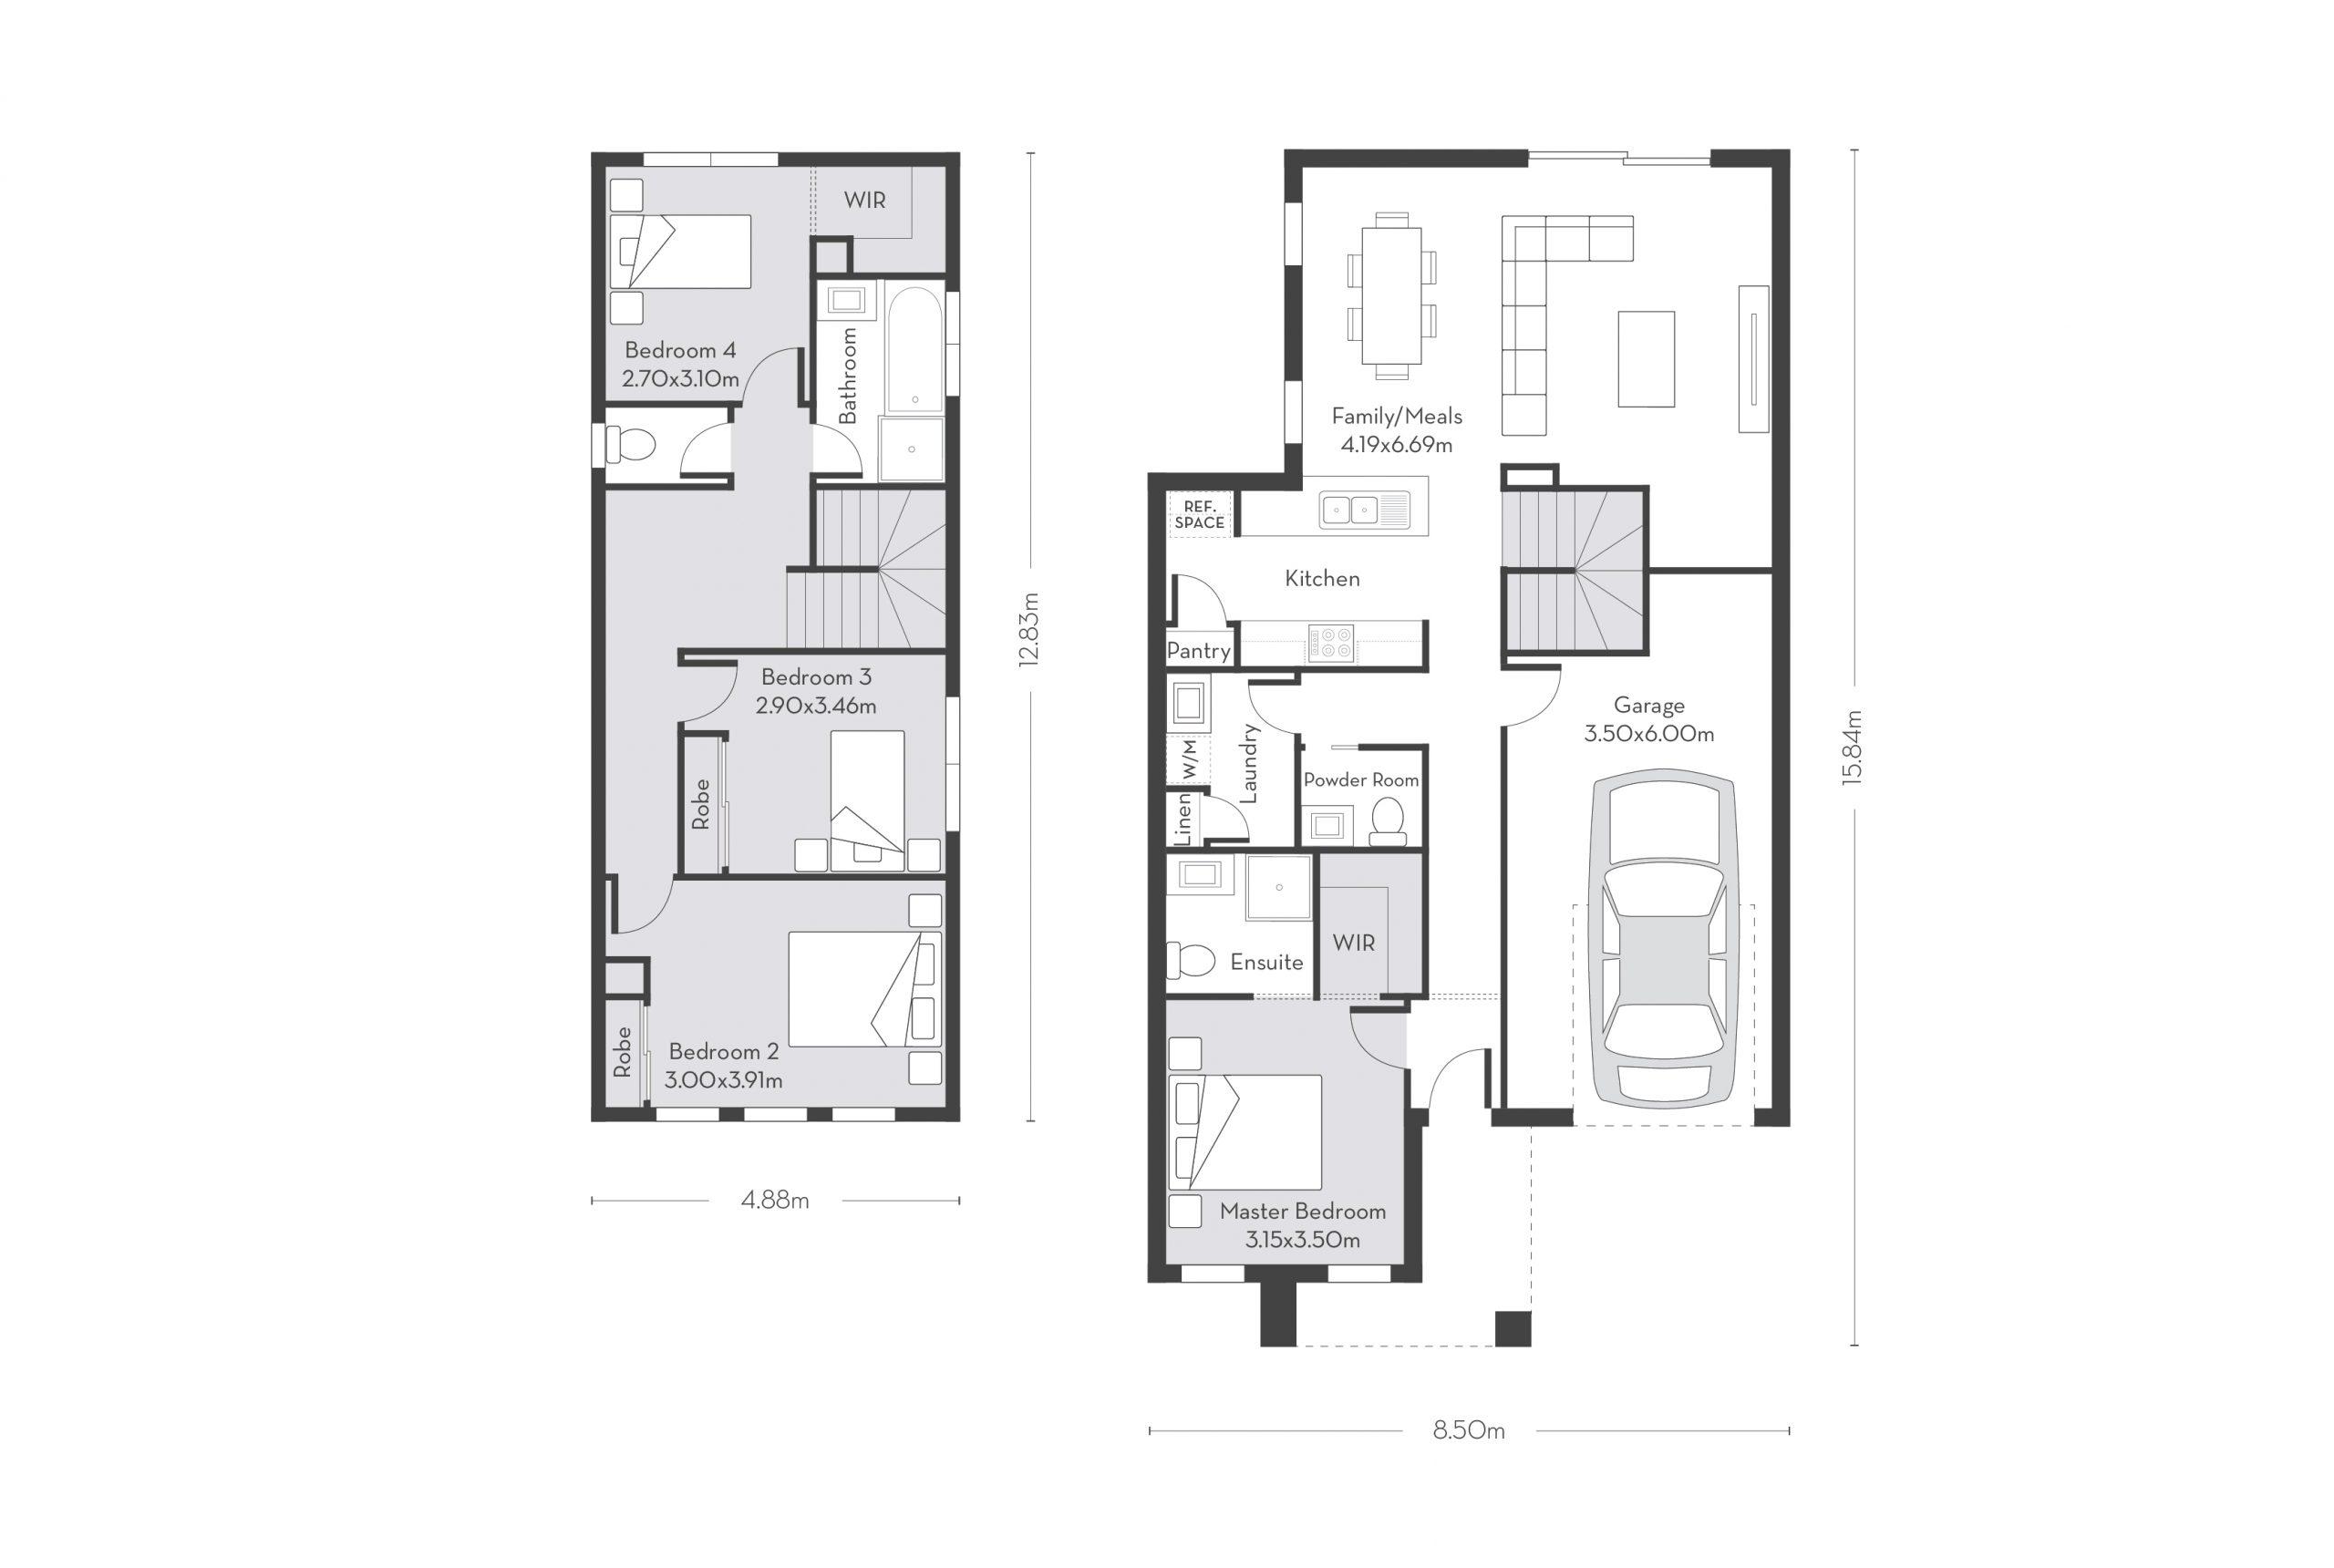 Rio 19 (D) Floor Plans